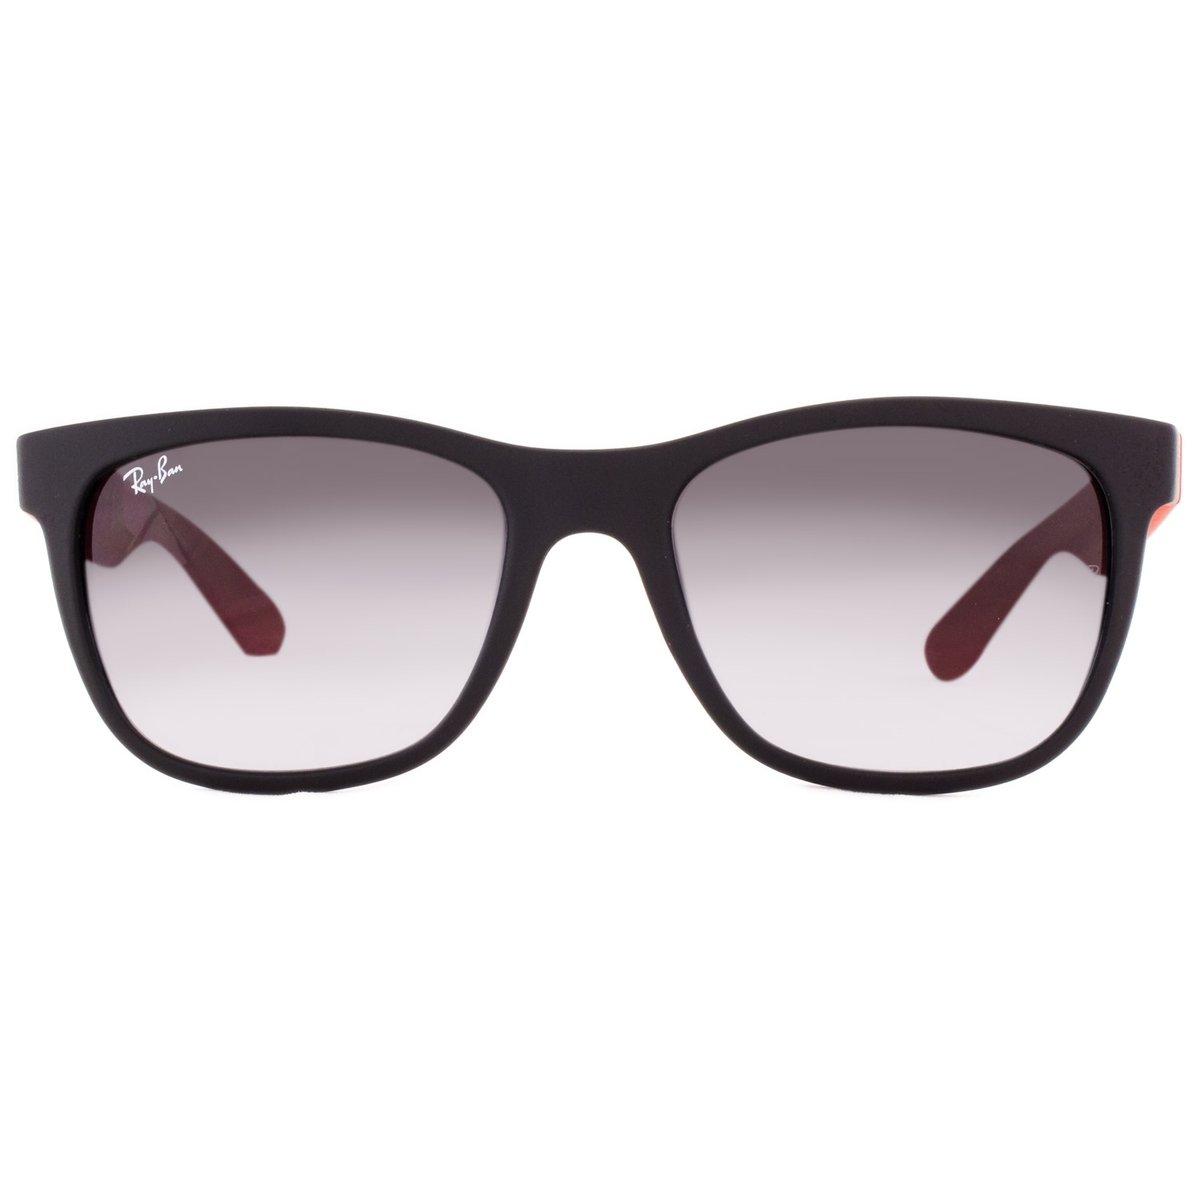 a00a63e317f79 Óculos Ray Ban Sergio RB4219L 61608 54 - Compre Agora   Netshoes